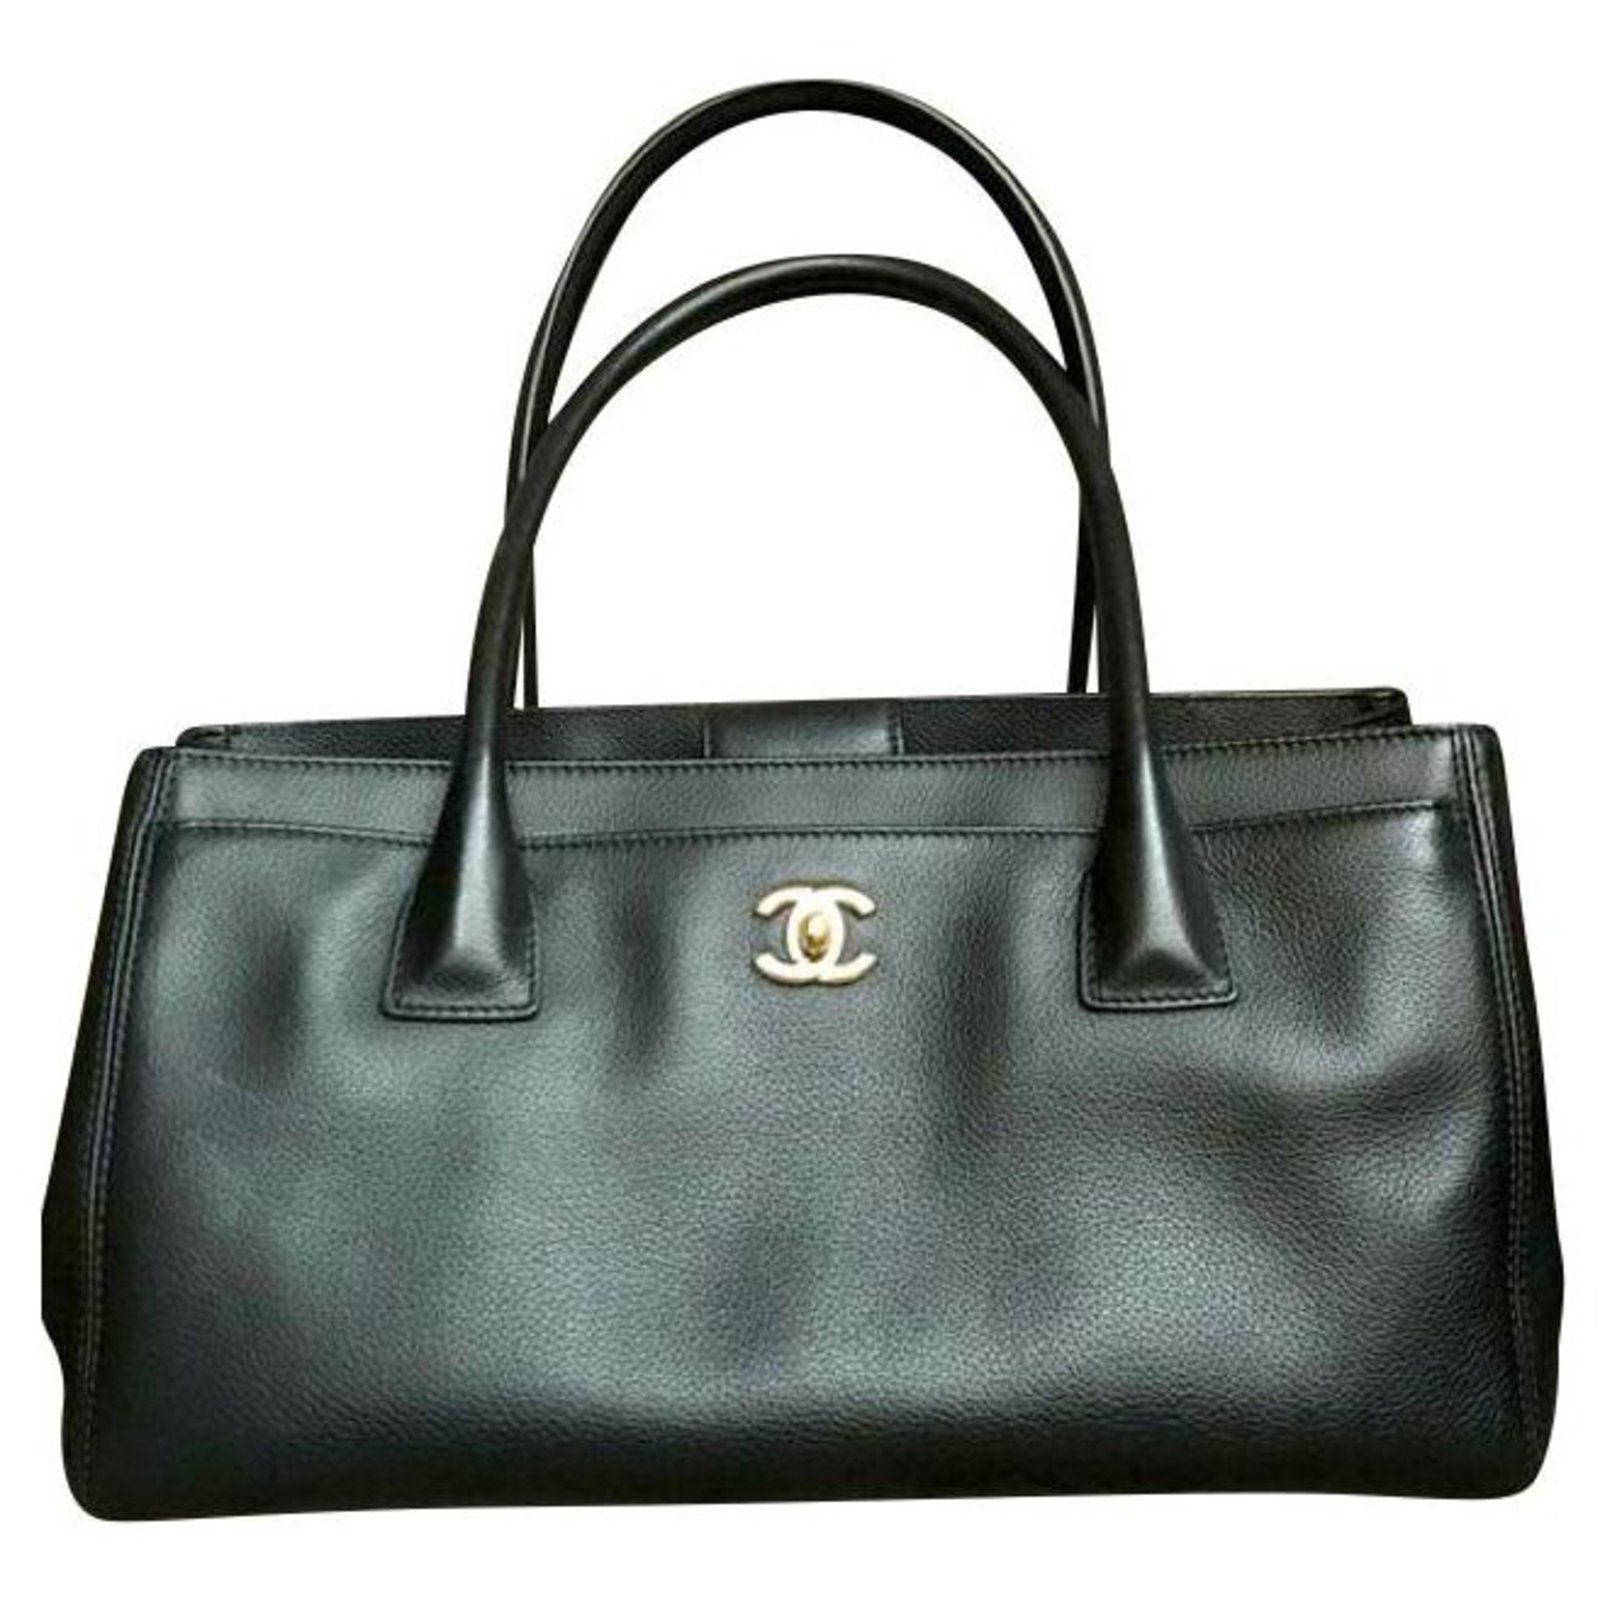 Chanel Handbags Leather Black